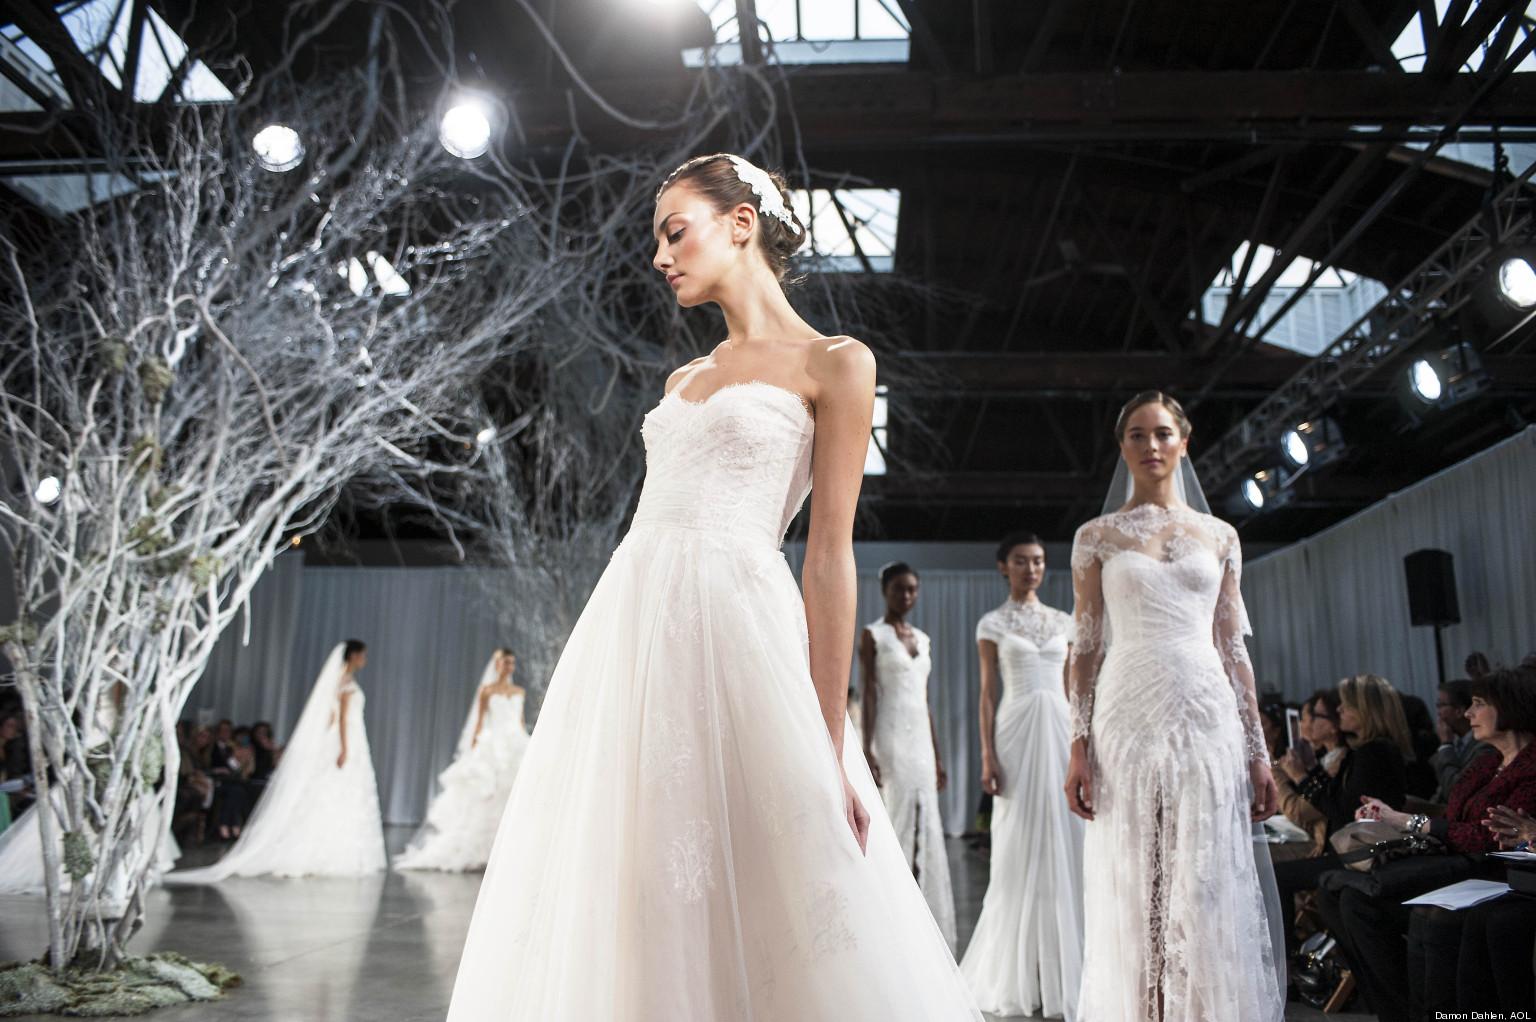 Wedding Gowns New York: Monique Lhuillier, Bridal Designer, Talks Fall 2013